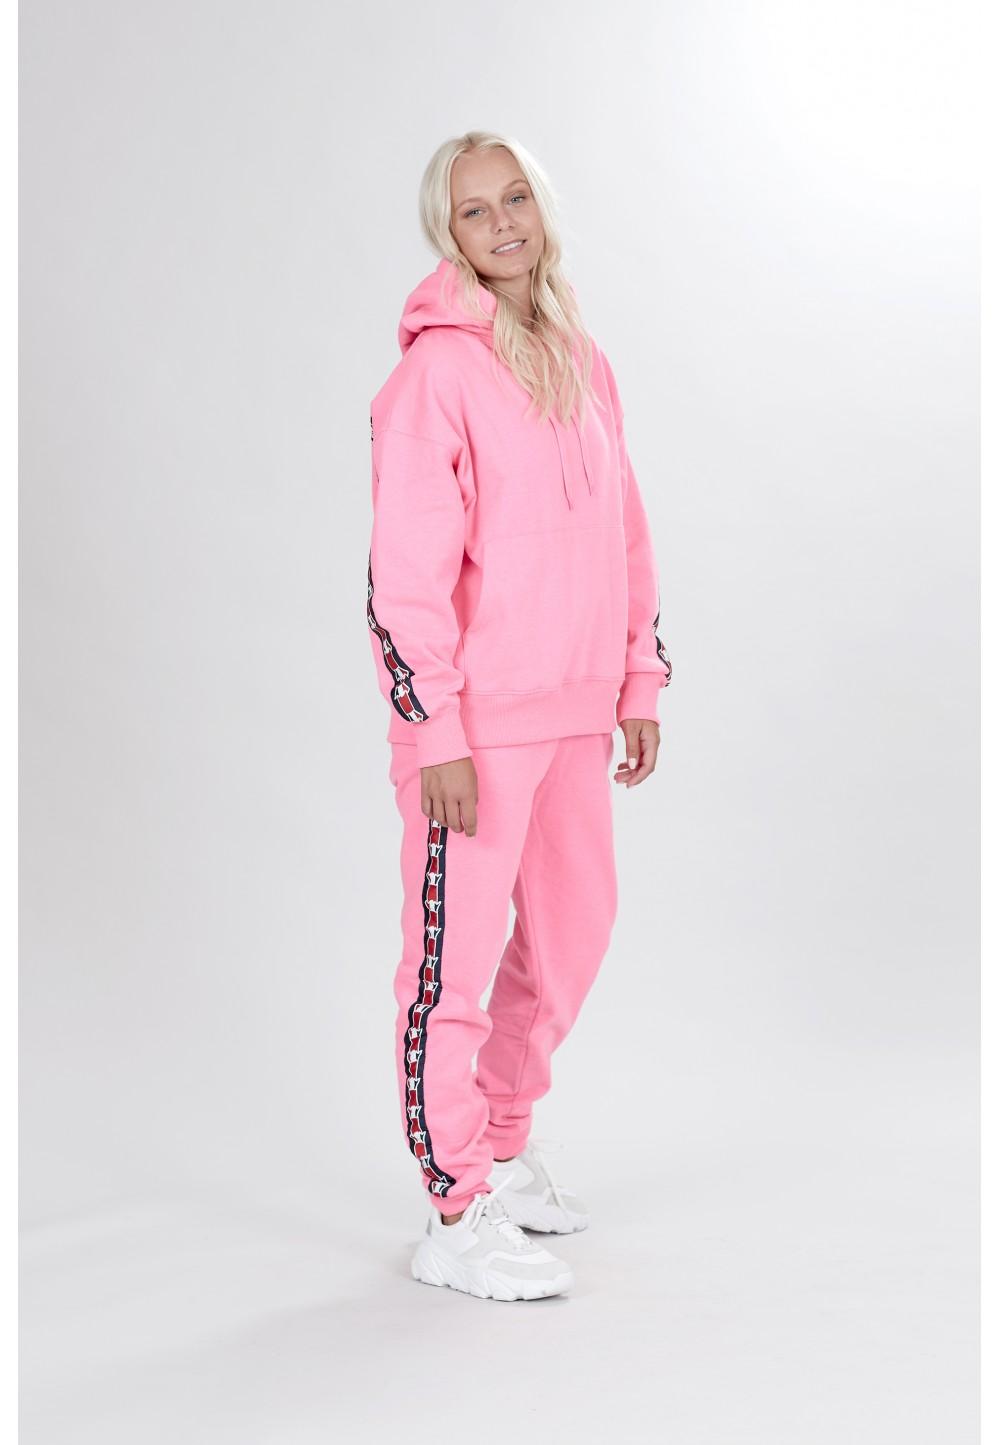 Розовое худи с капюшоном на шнурках